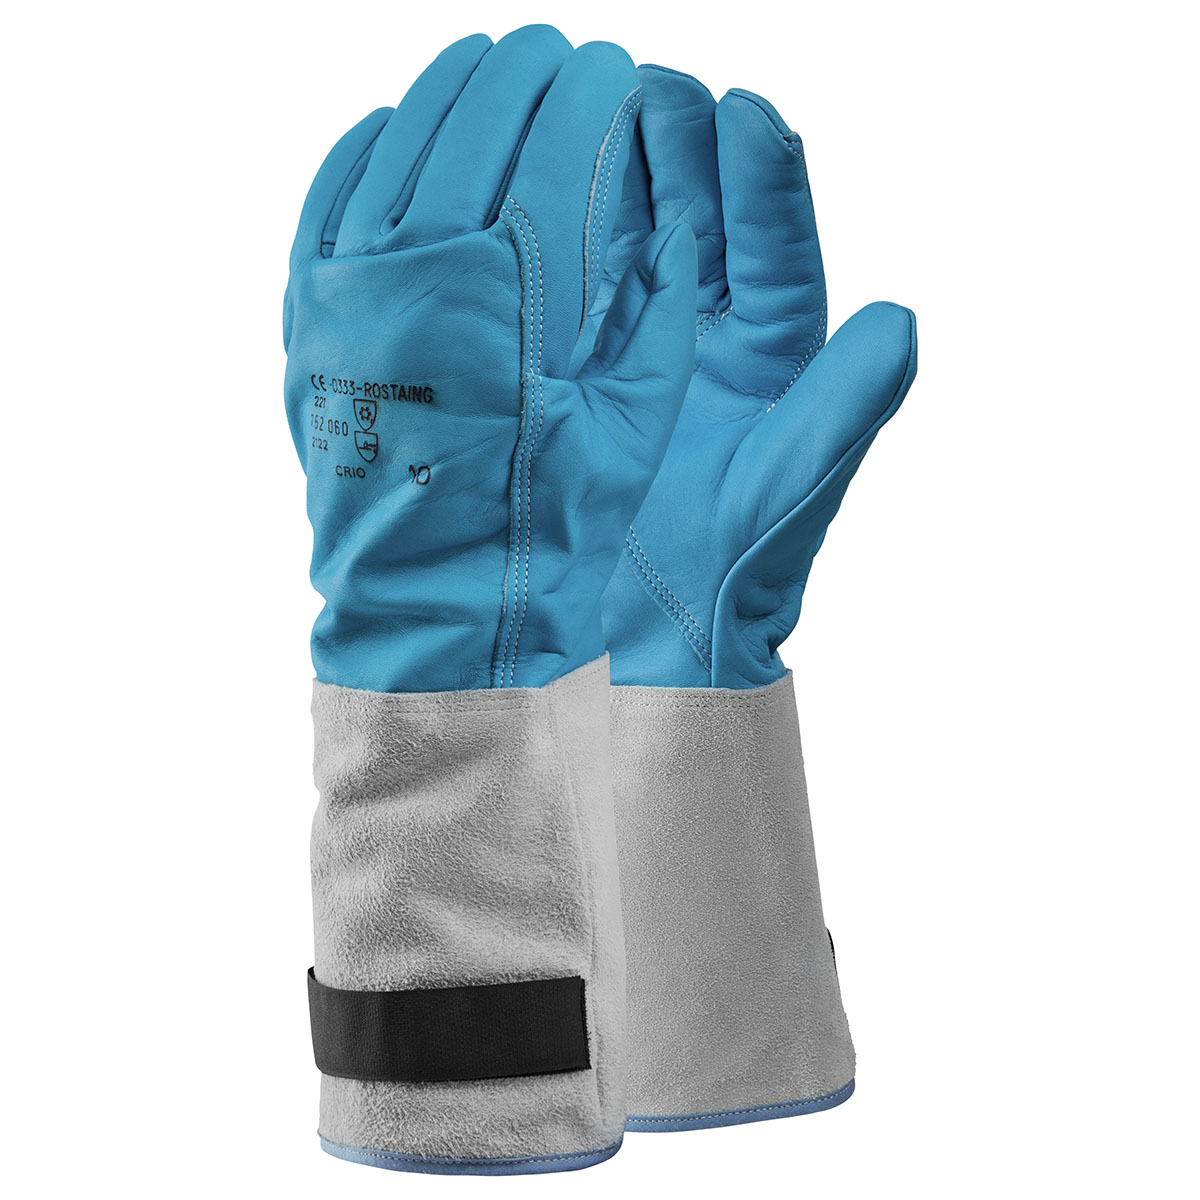 Ultra-Low Temperature Protective Gauntlet